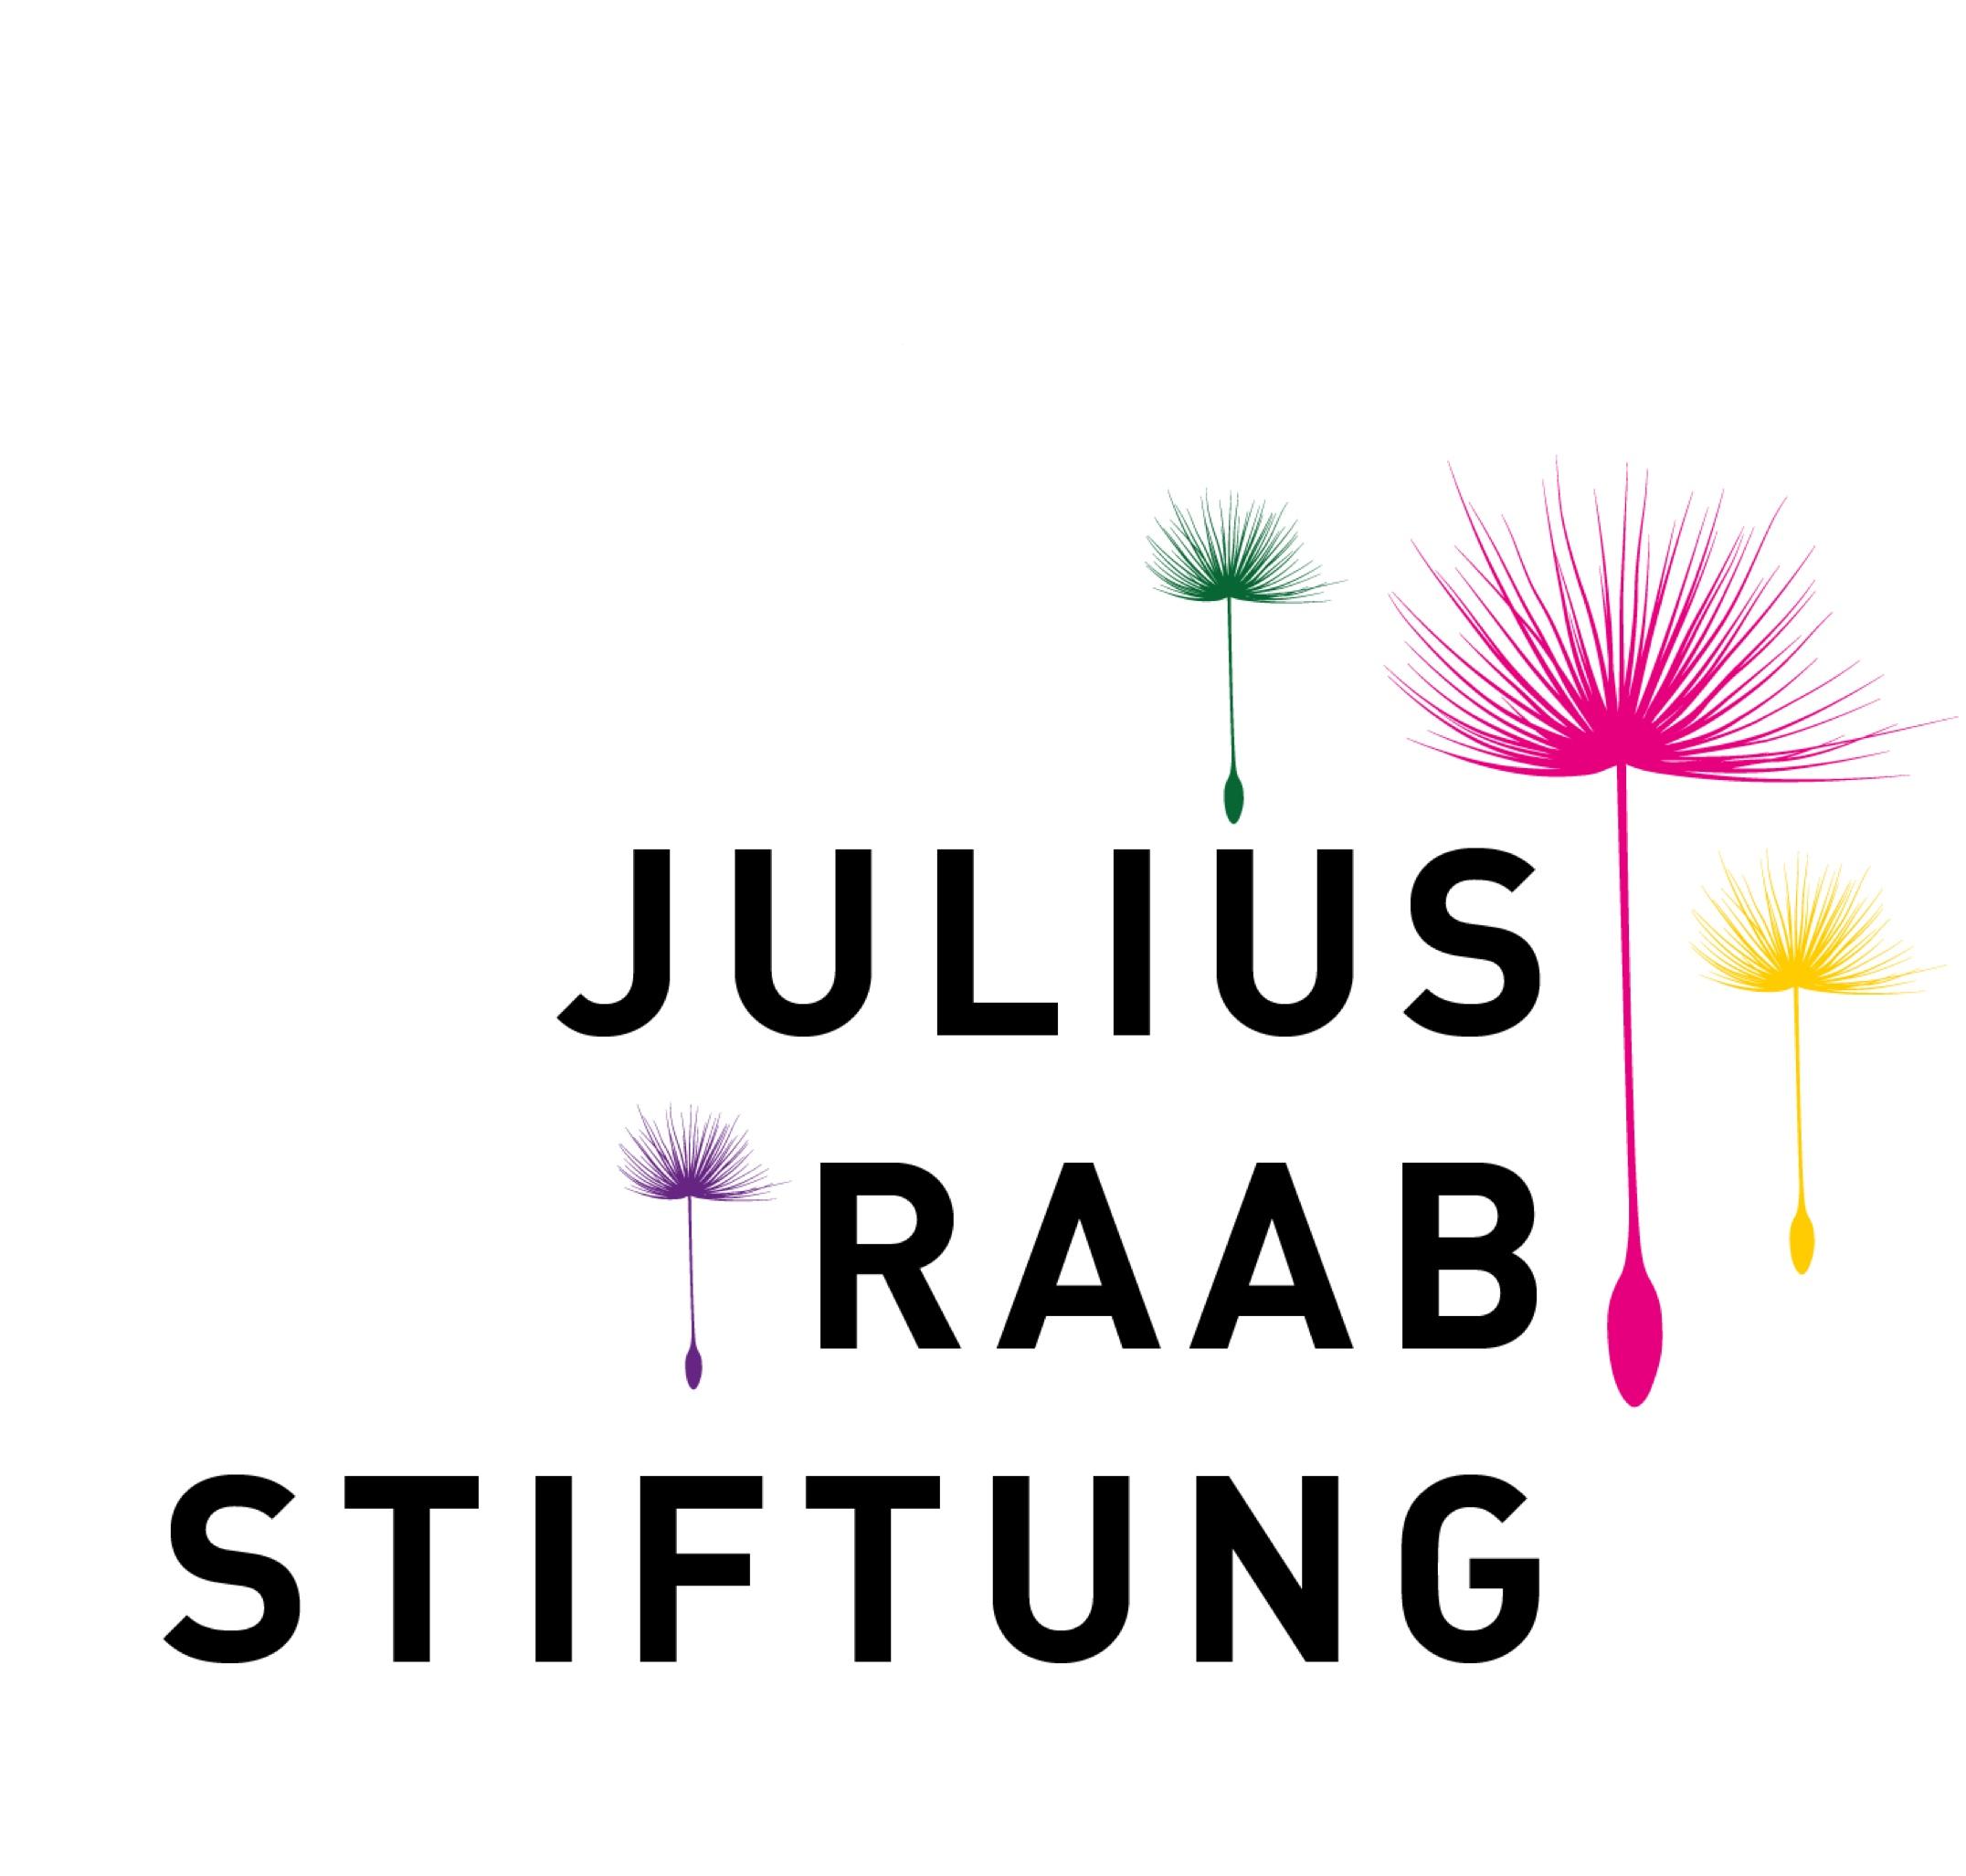 Julius Raab Stiftung